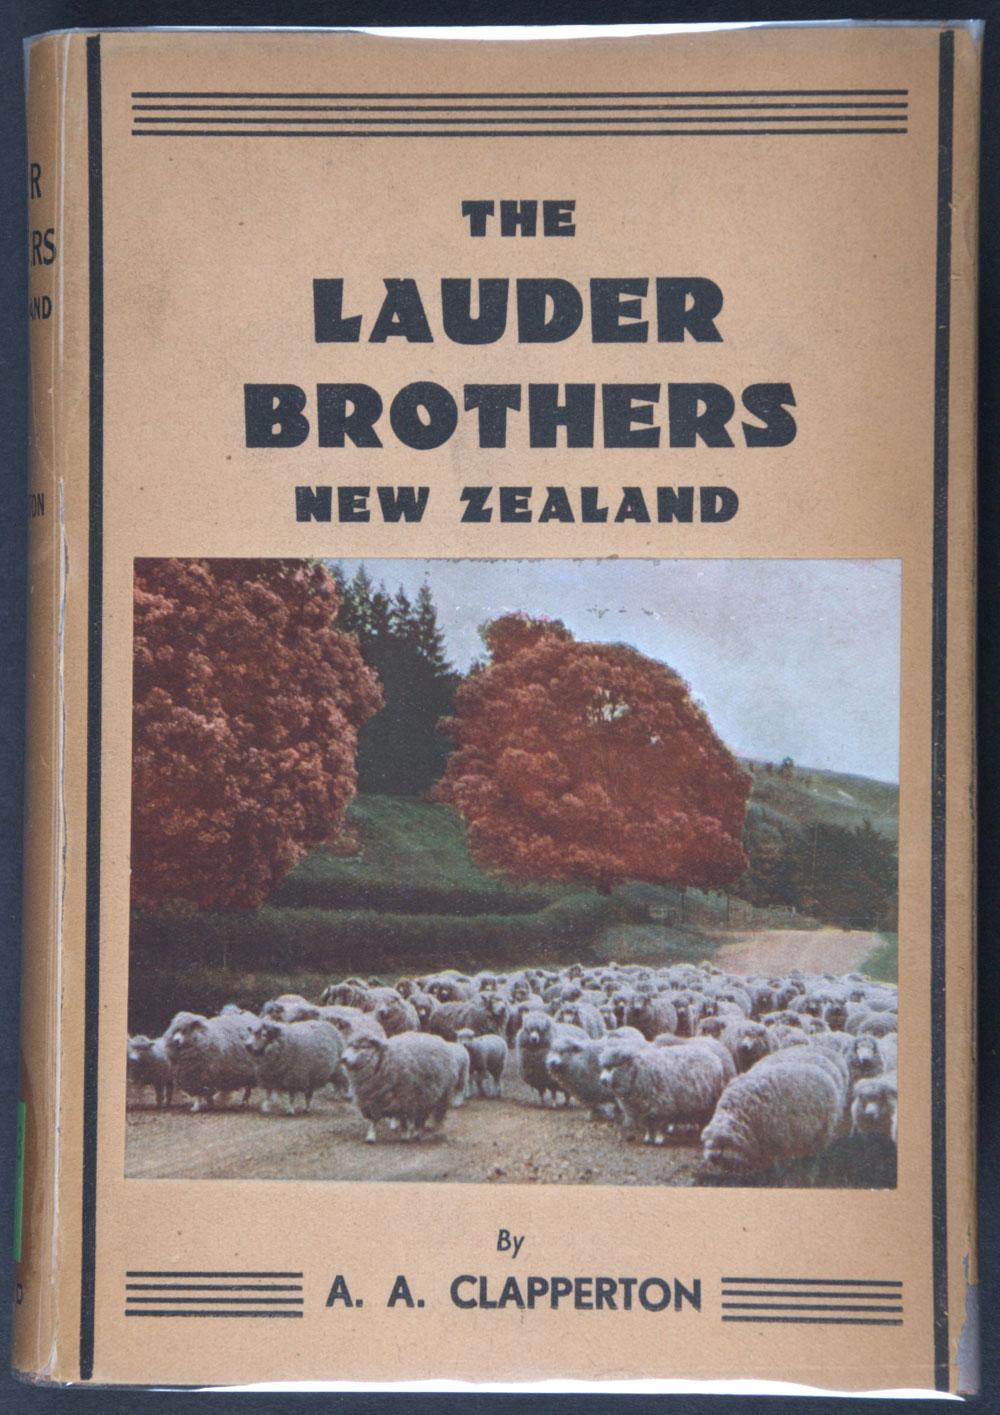 A.A. Clapperton. <em>The Lauder brothers</em>, New Zealand. Dunedin: A.H. & A.W. Reed, 1936.